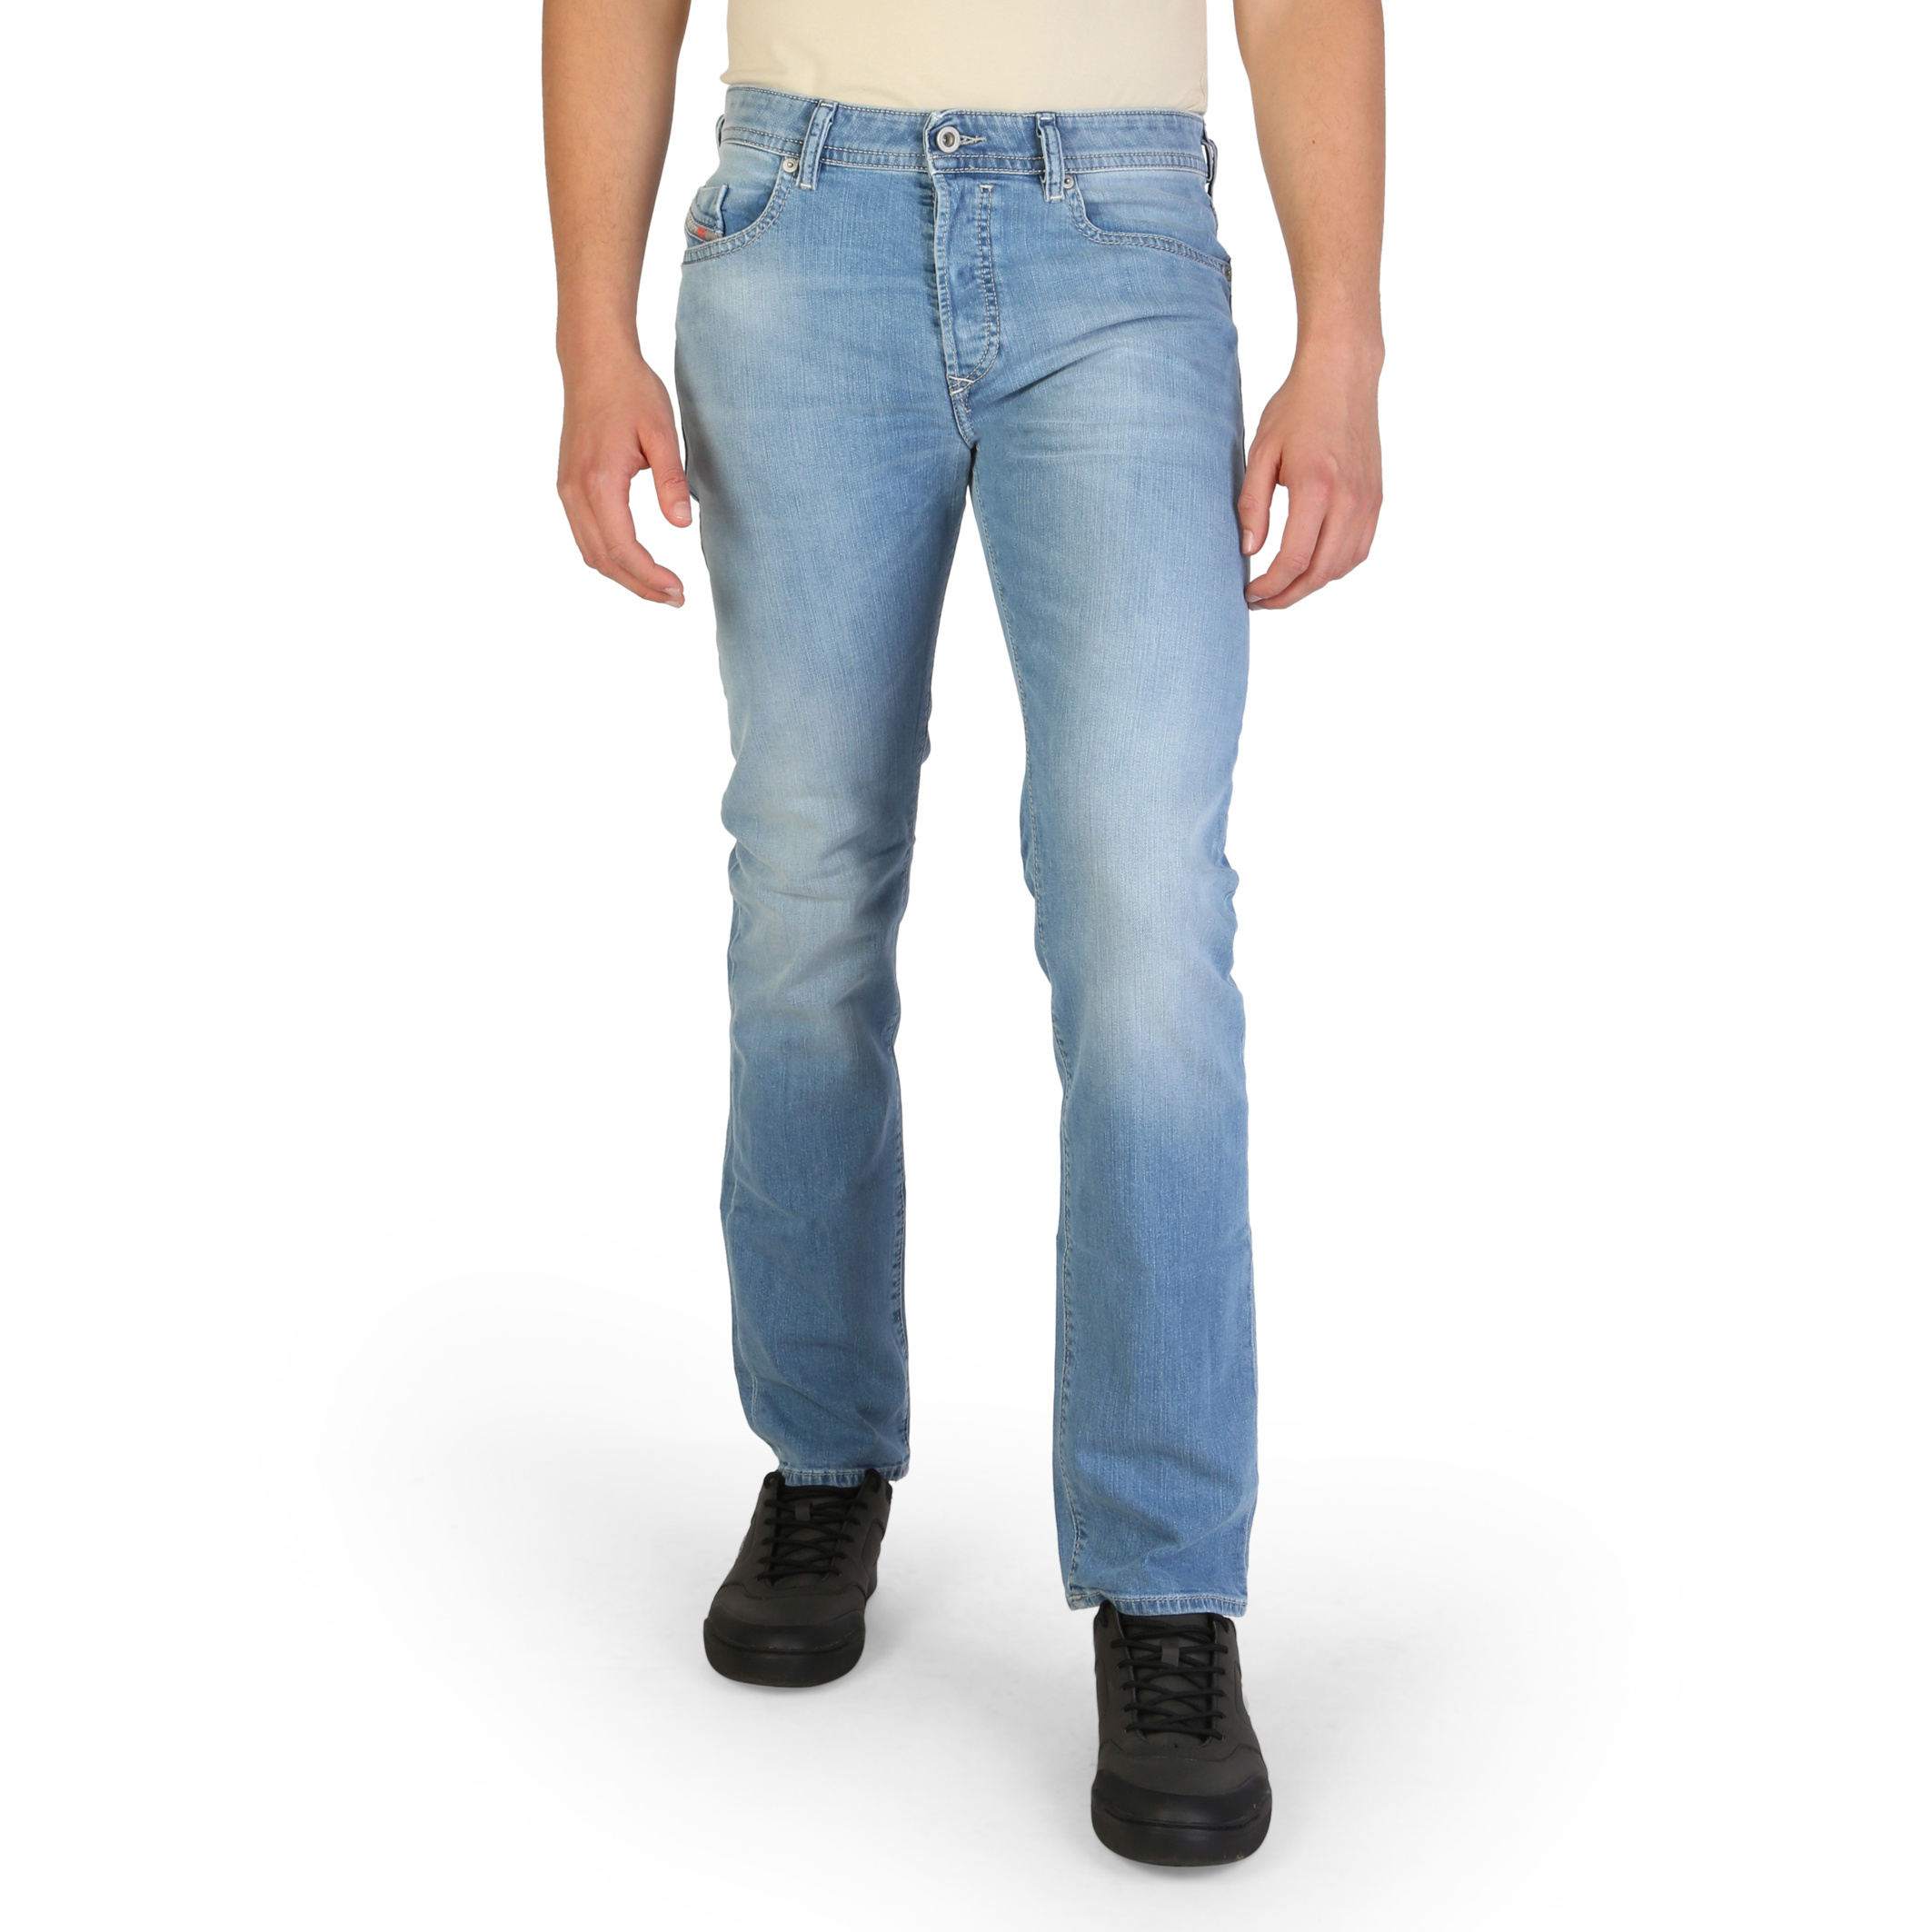 Jeans Diesel BUSTER_L32_00SDHB Uomo Blu 100046